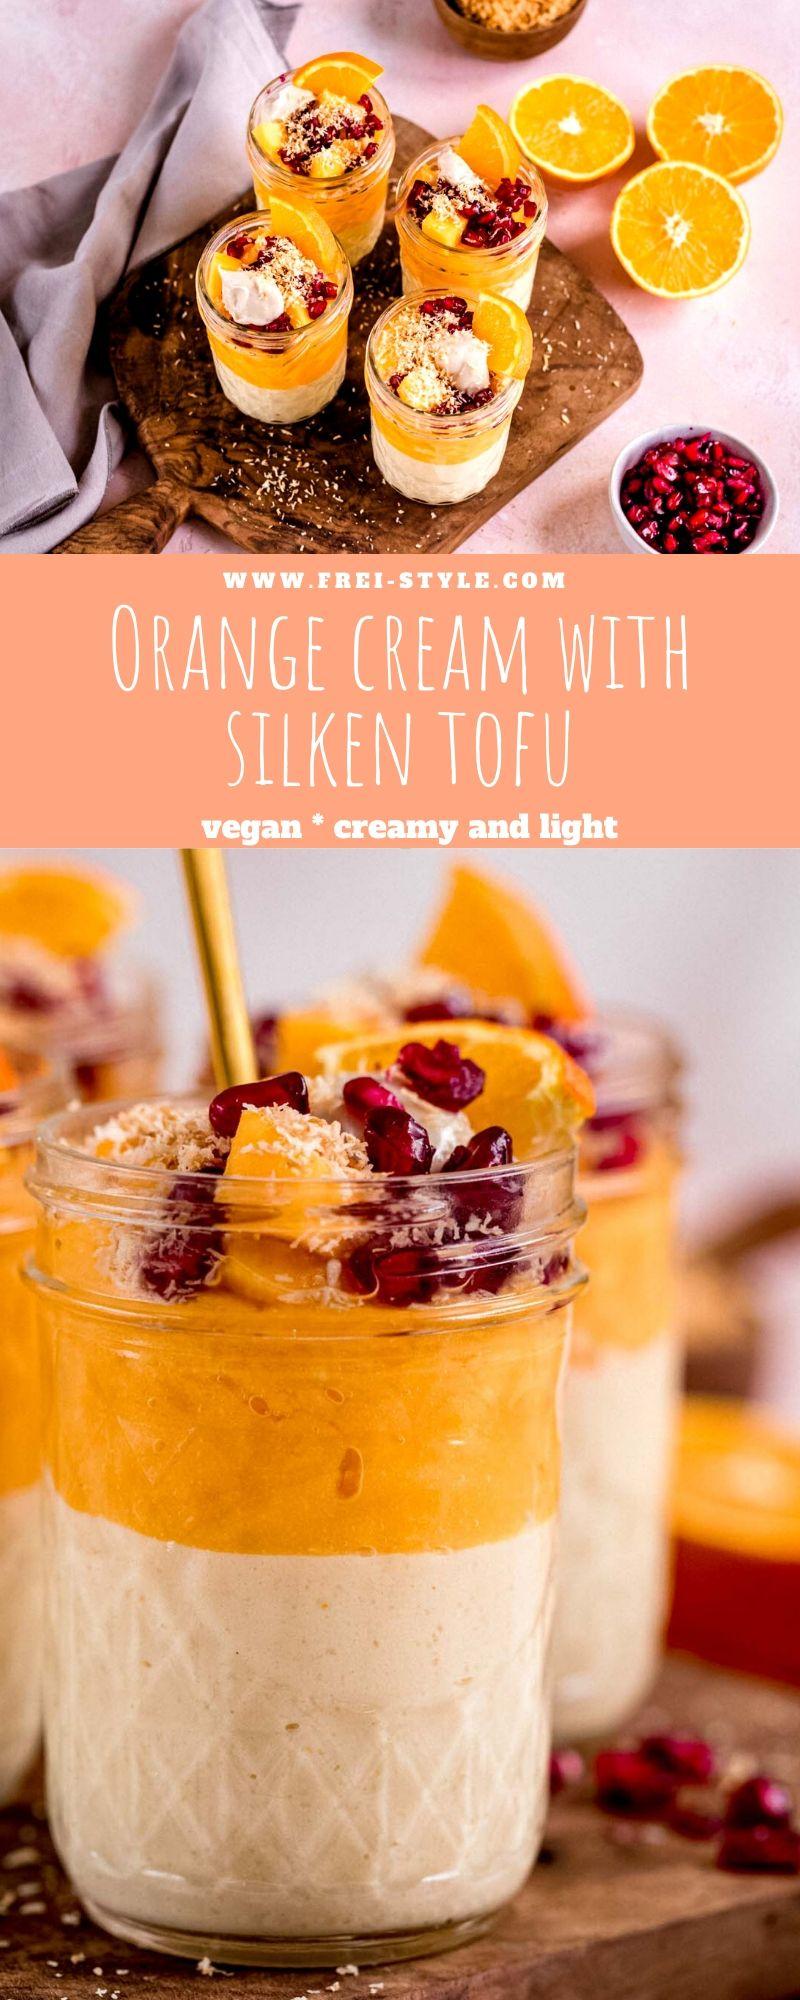 Orange cream with silken tofu